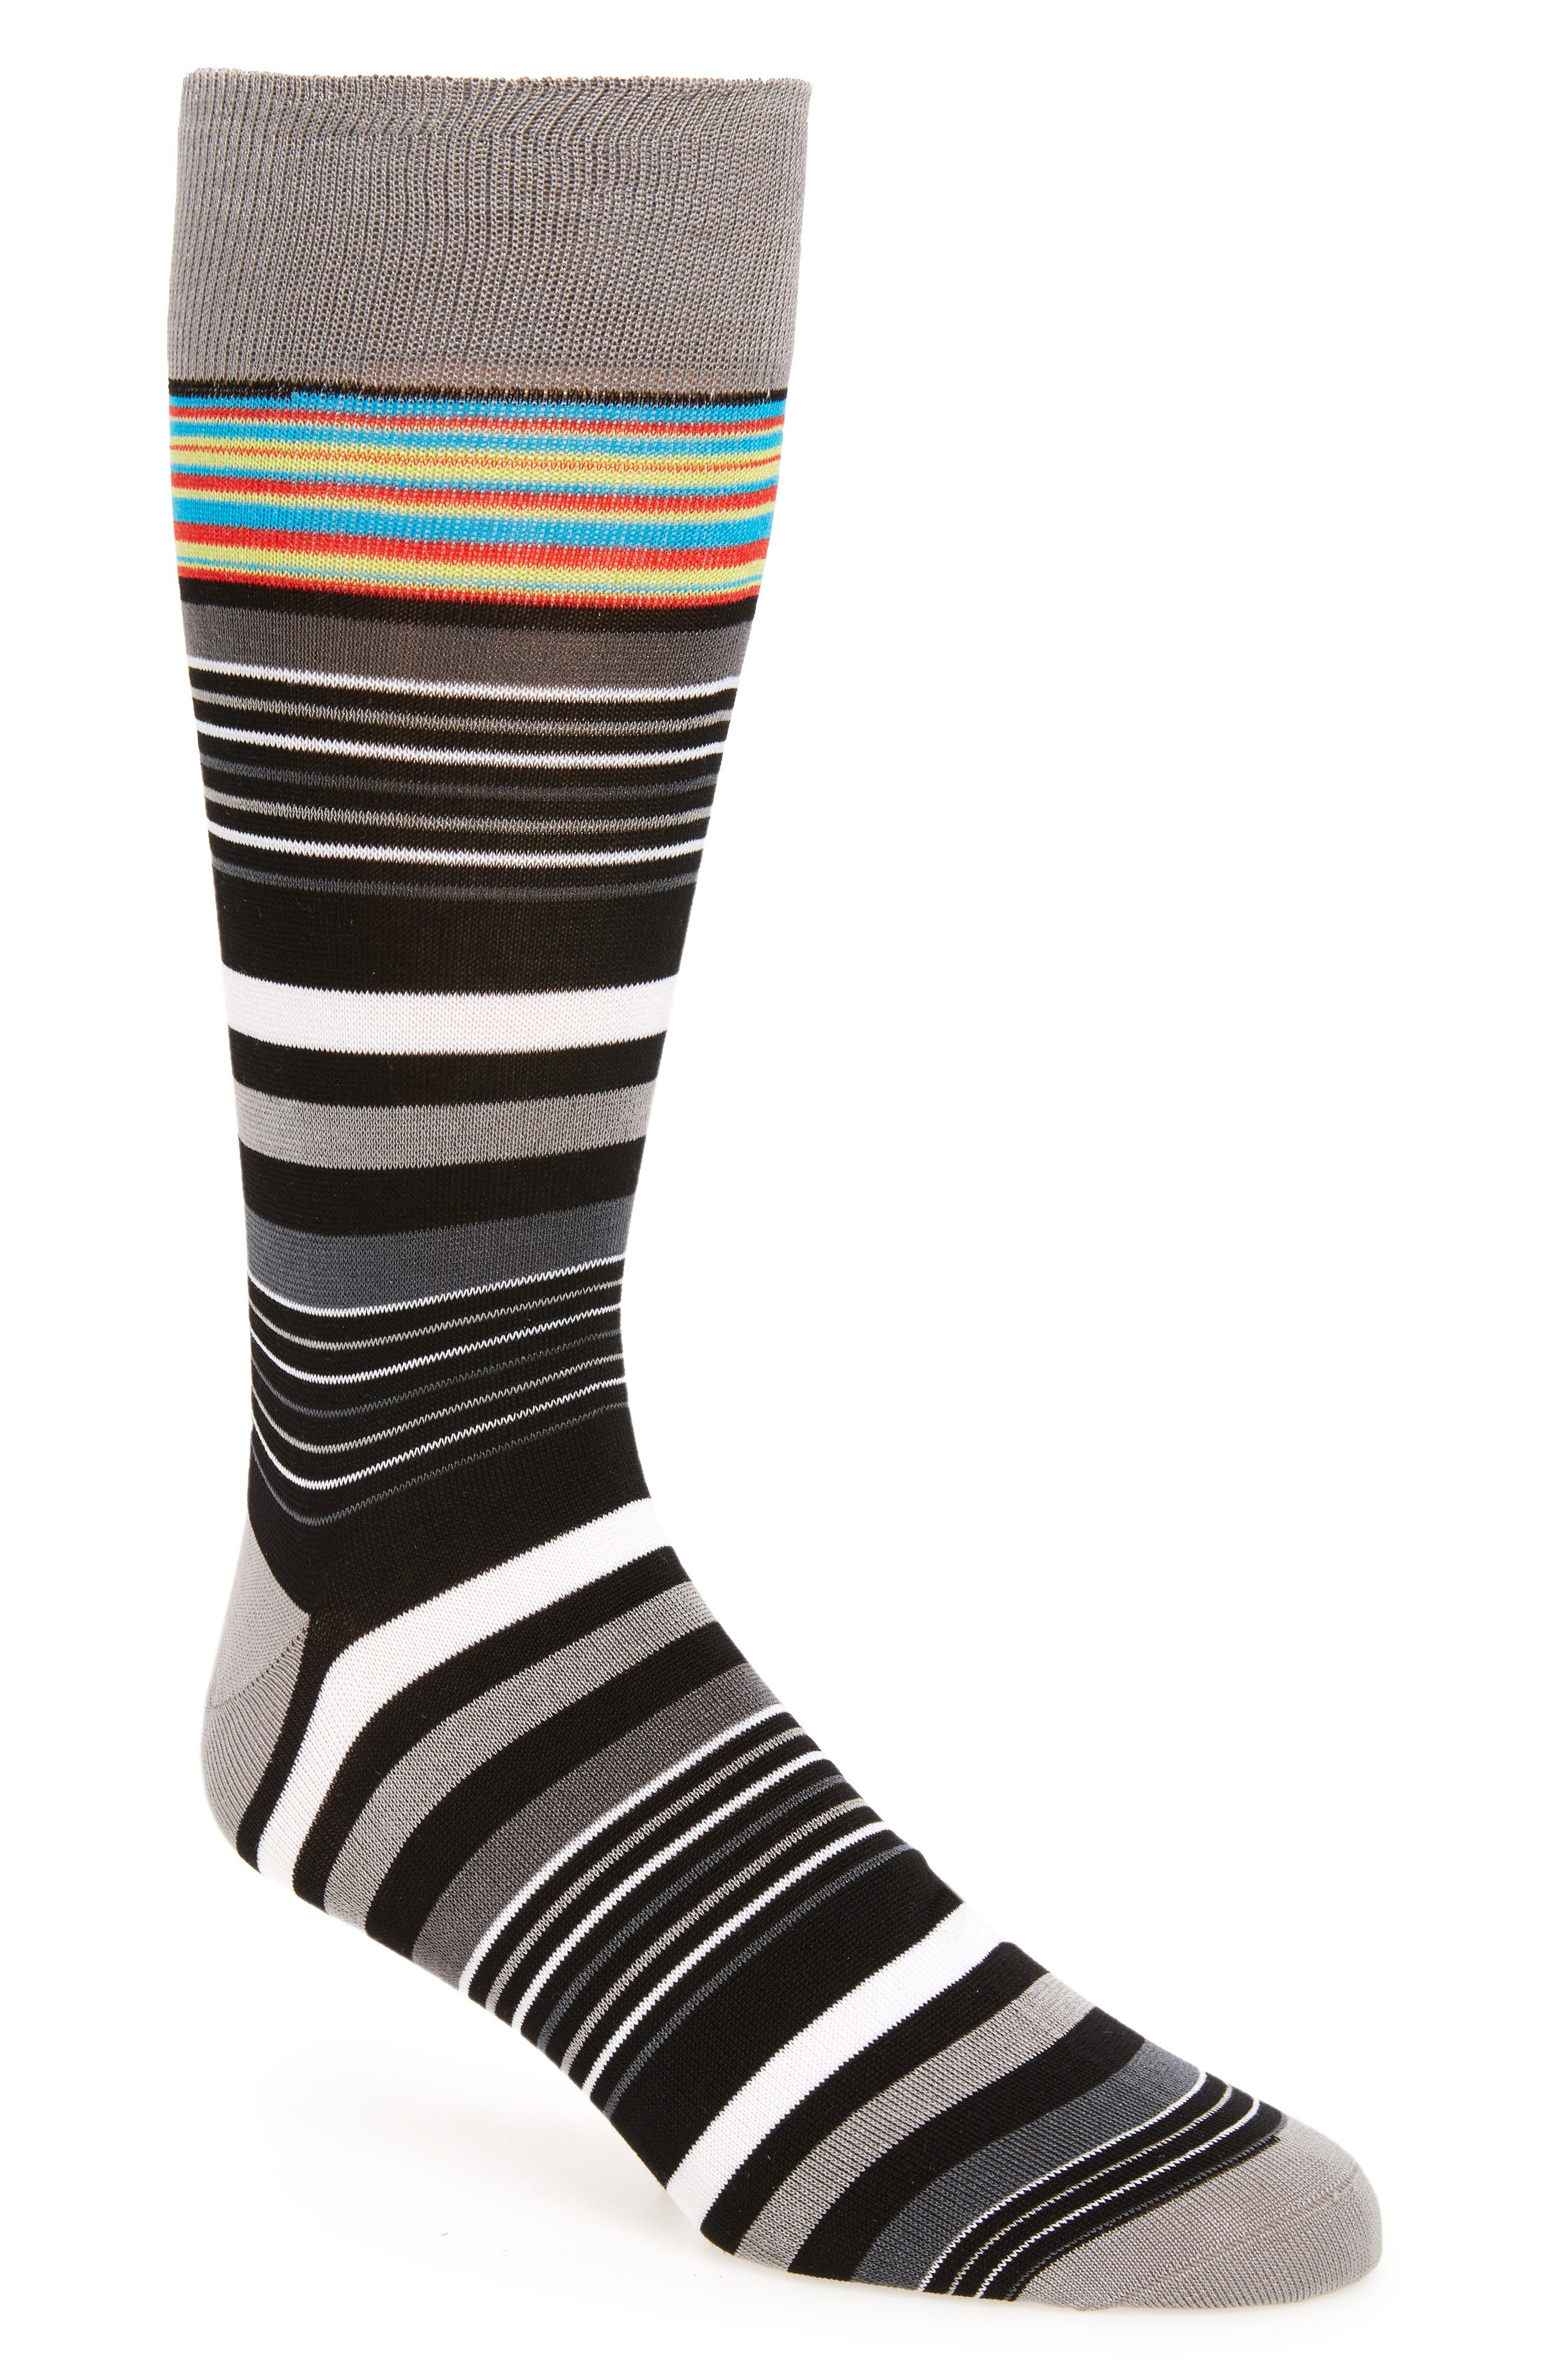 Alternate Image 1 Selected - Bugatchi Stripe Crew Socks